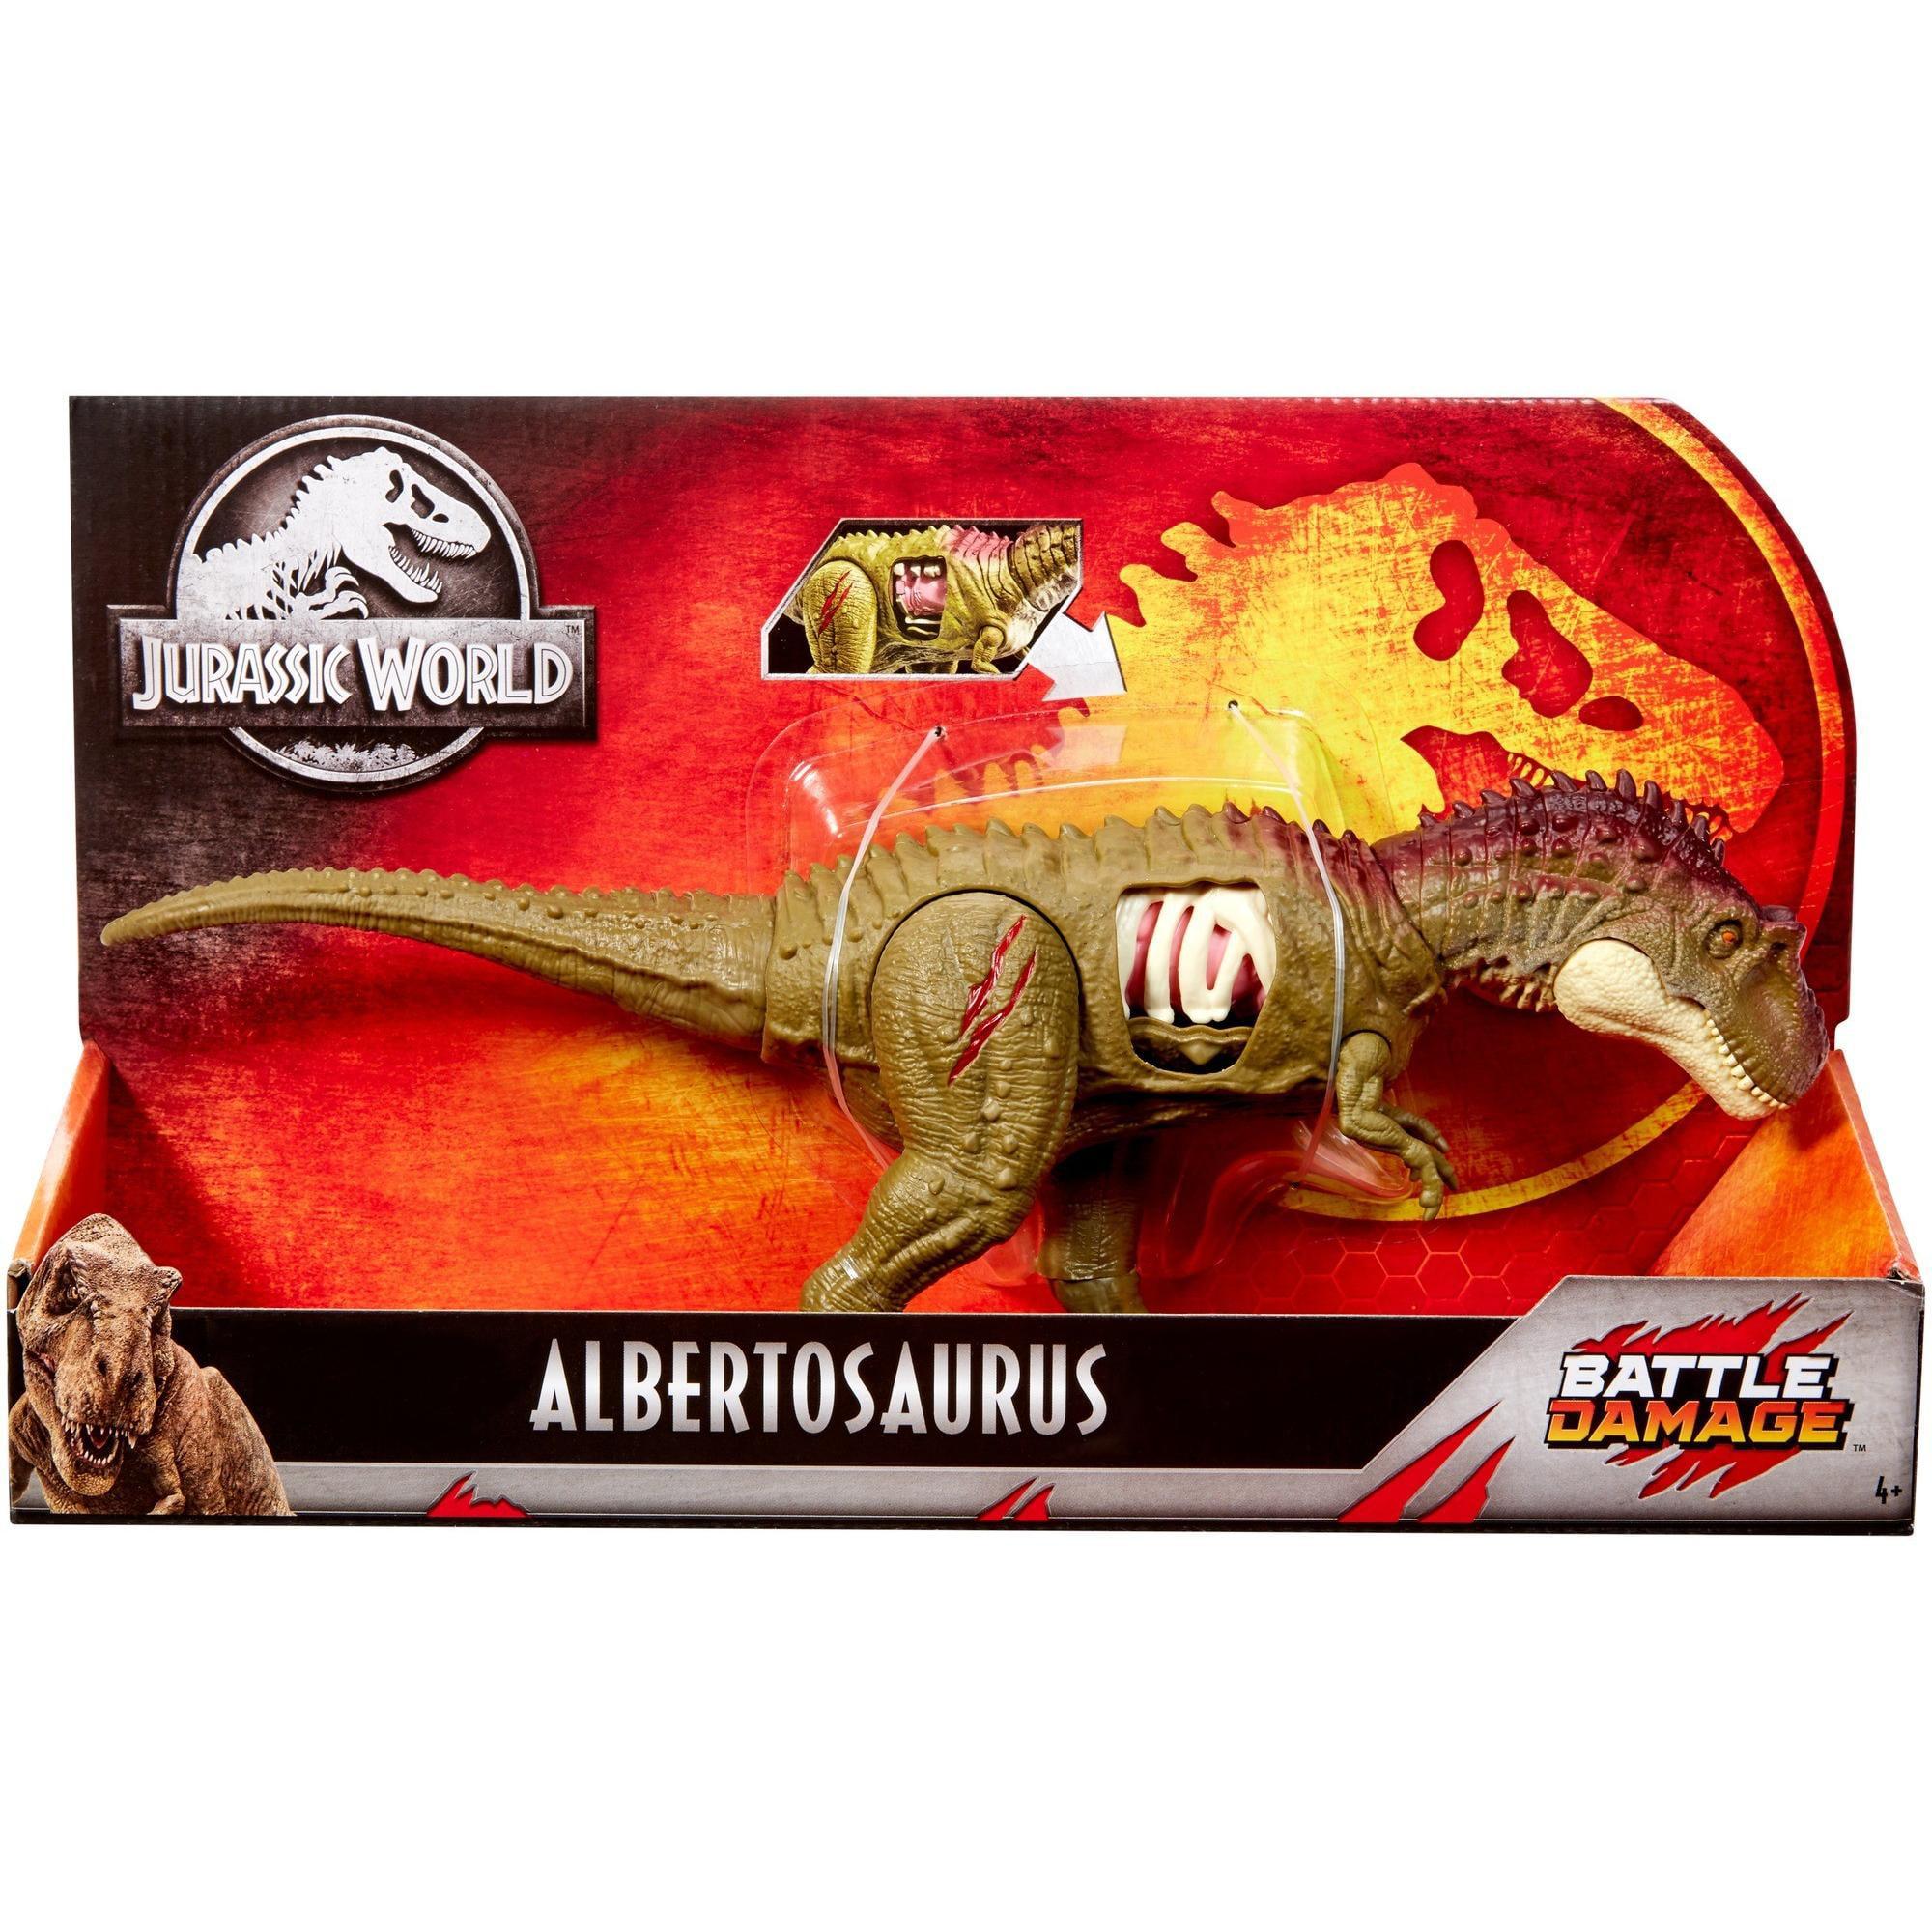 Jurassic World Indominus Rex Dinosaur Coloring Page | Dinosaur ... | 2000x2000